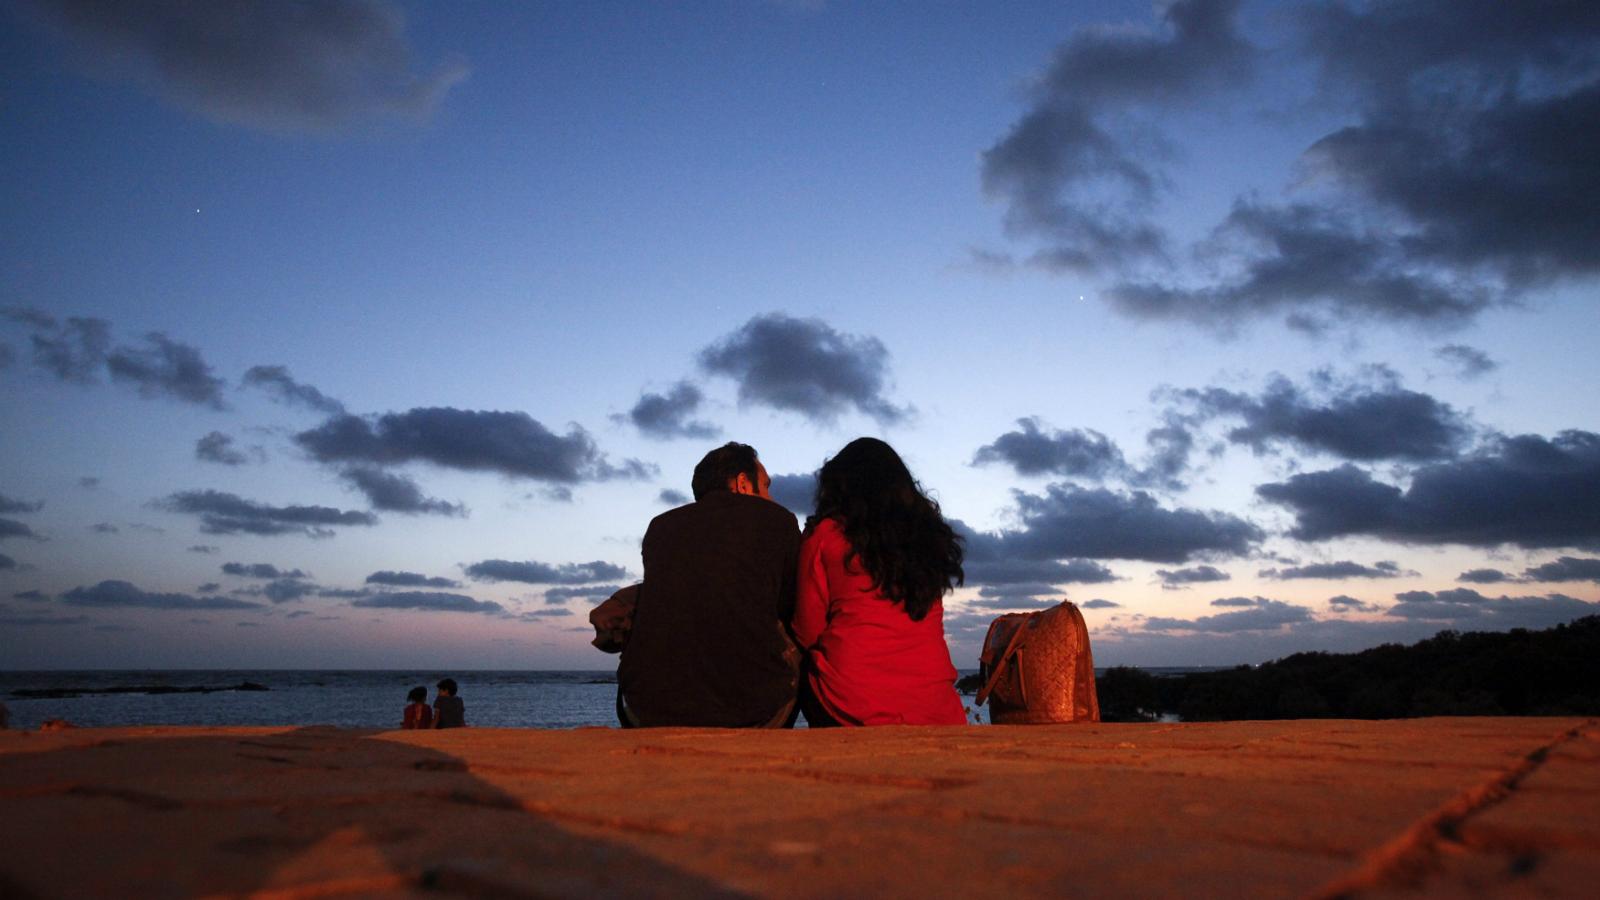 A couple sits along the seafront promenade at dusk in Mumbai's suburbs May 16, 2012.